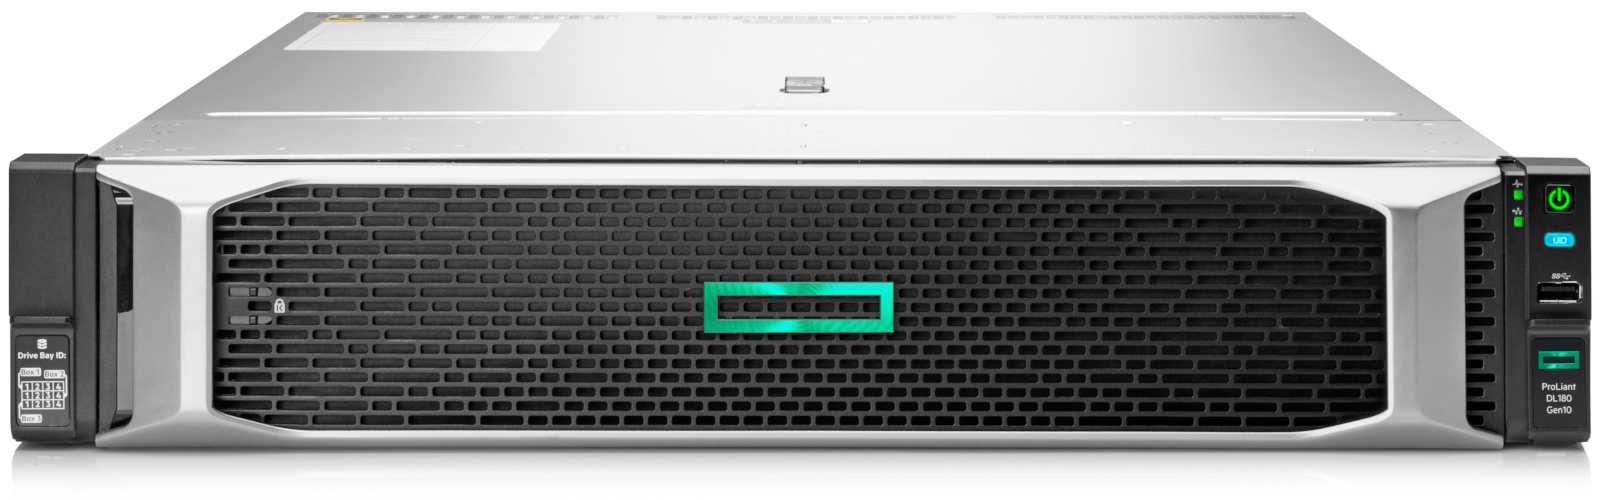 Hewlett Packard Enterprise ProLiant DL180 Gen10 server Intel Xeon Silver 2.1 GHz 16 GB DDR4-SDRAM 62 TB Rack (2U) 500 W